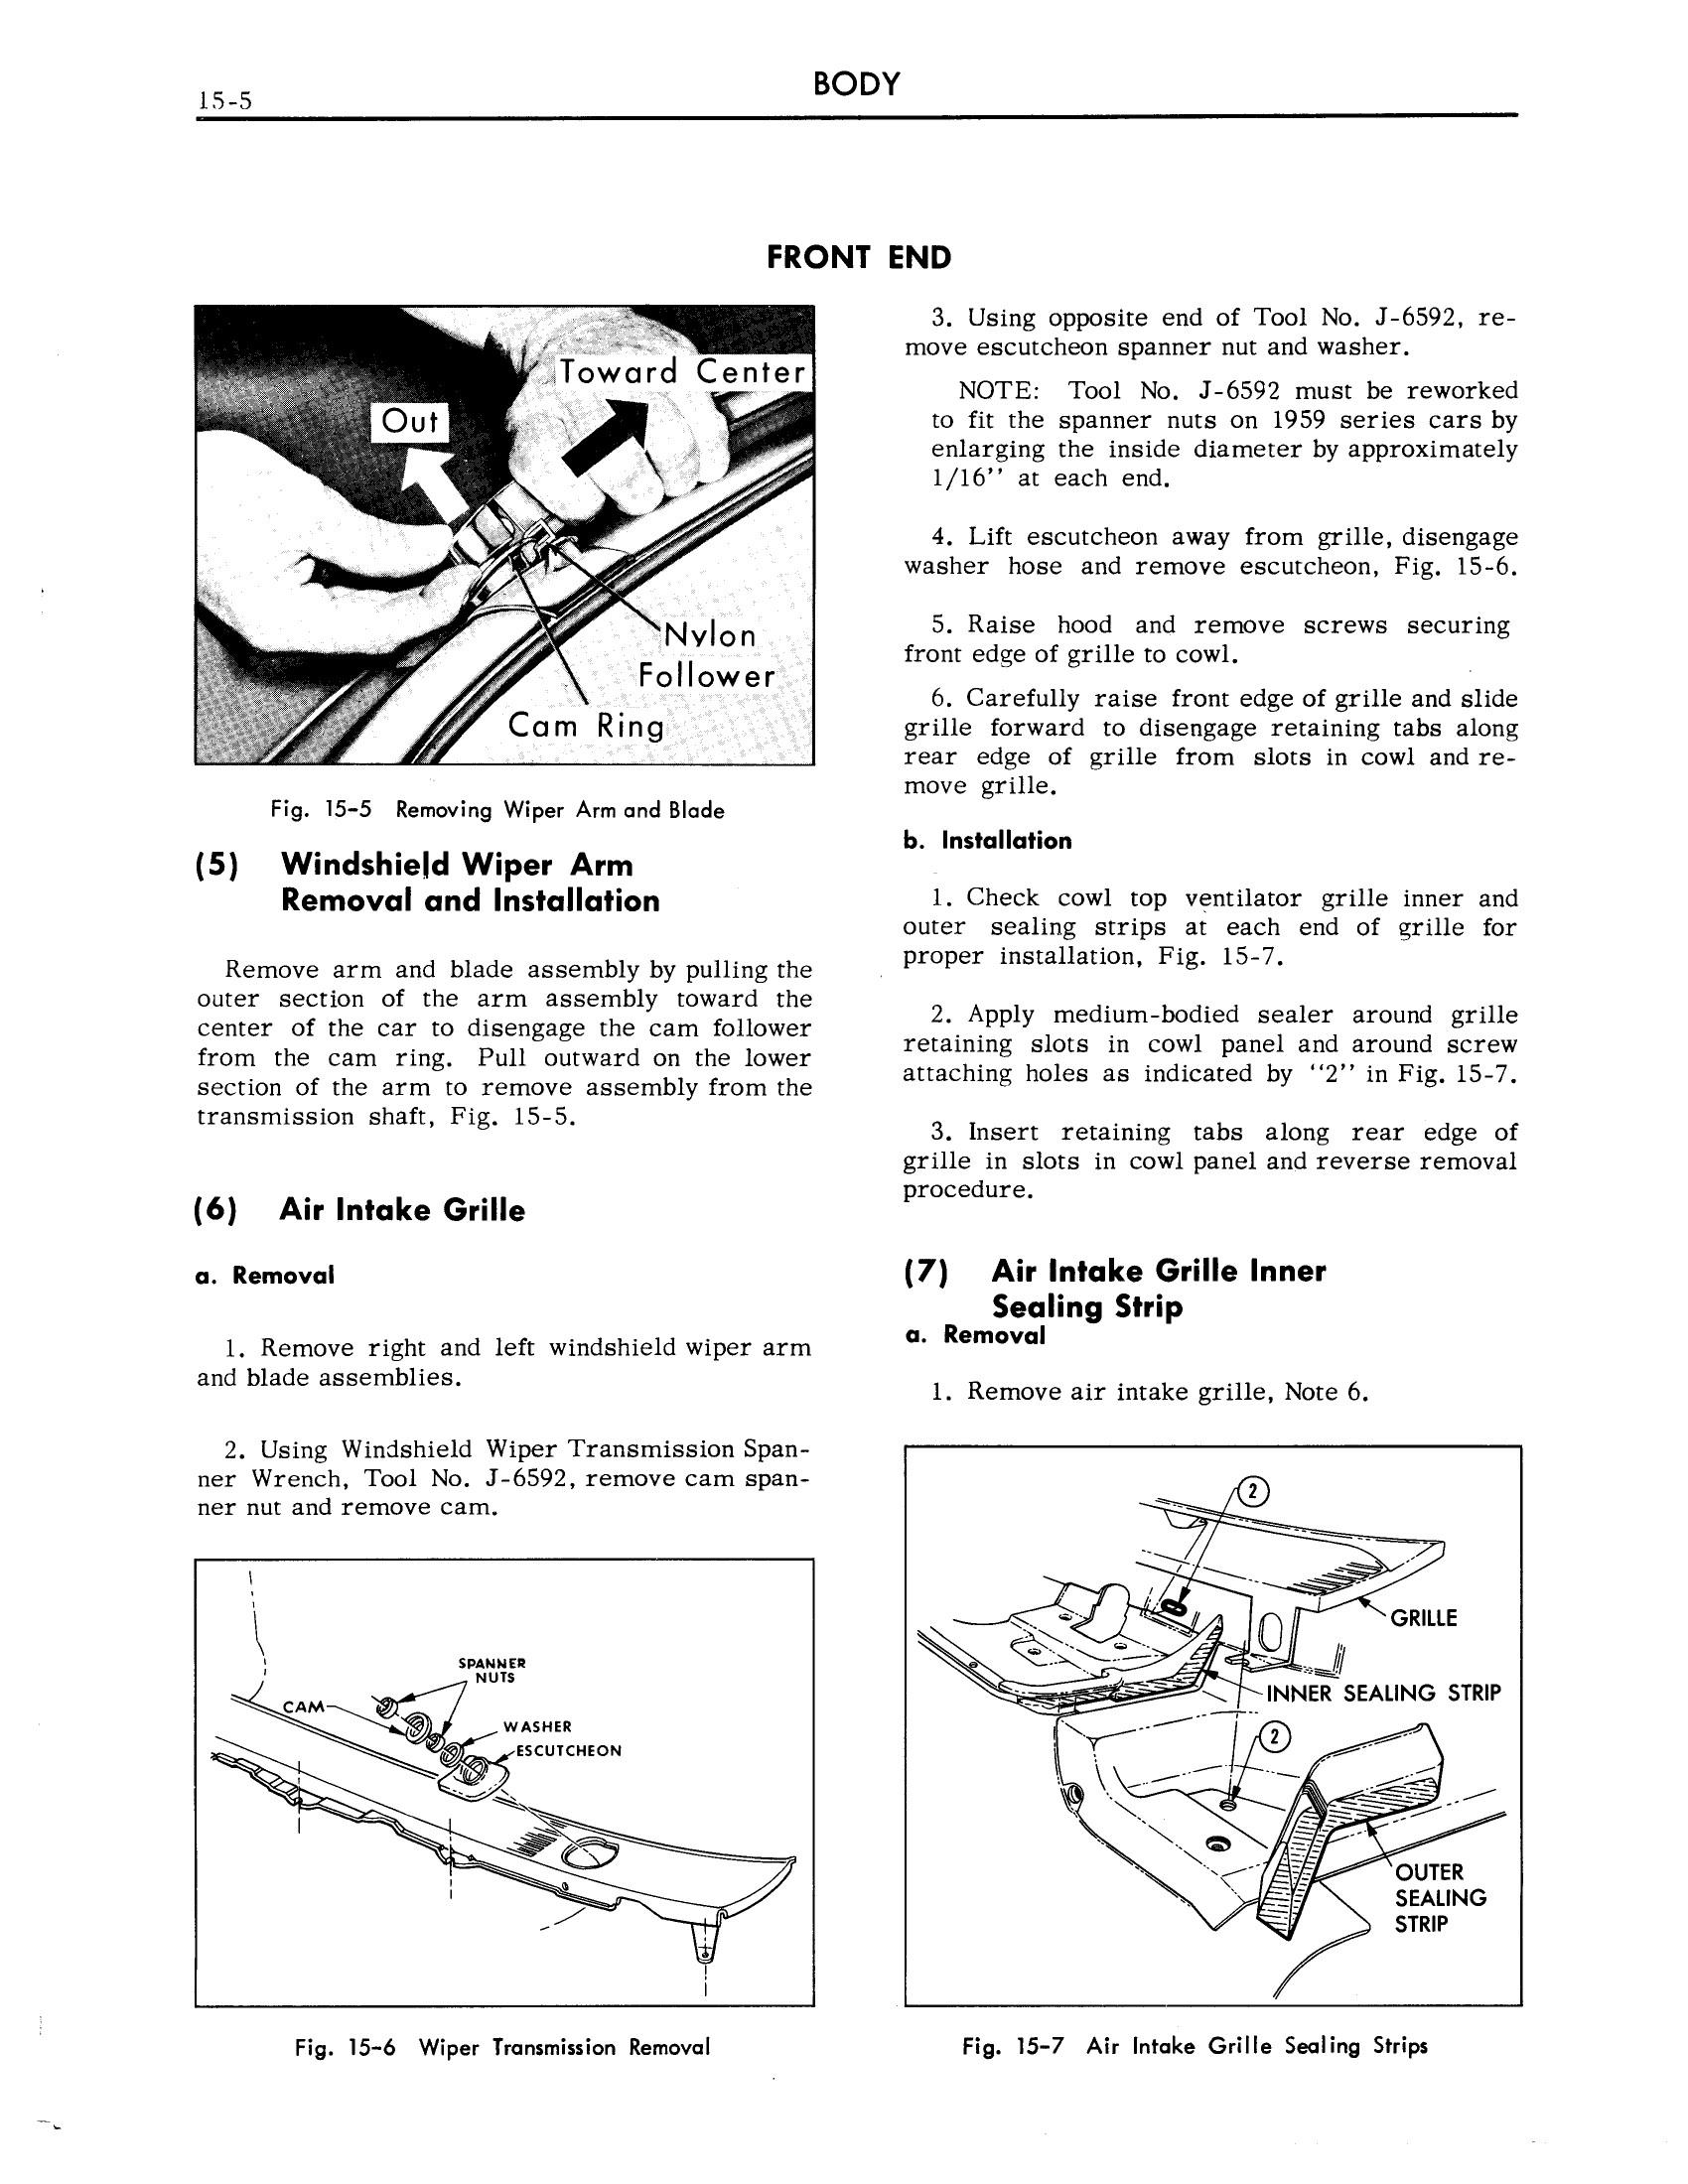 1959 Cadillac Shop Manual- Body Page 5 of 99